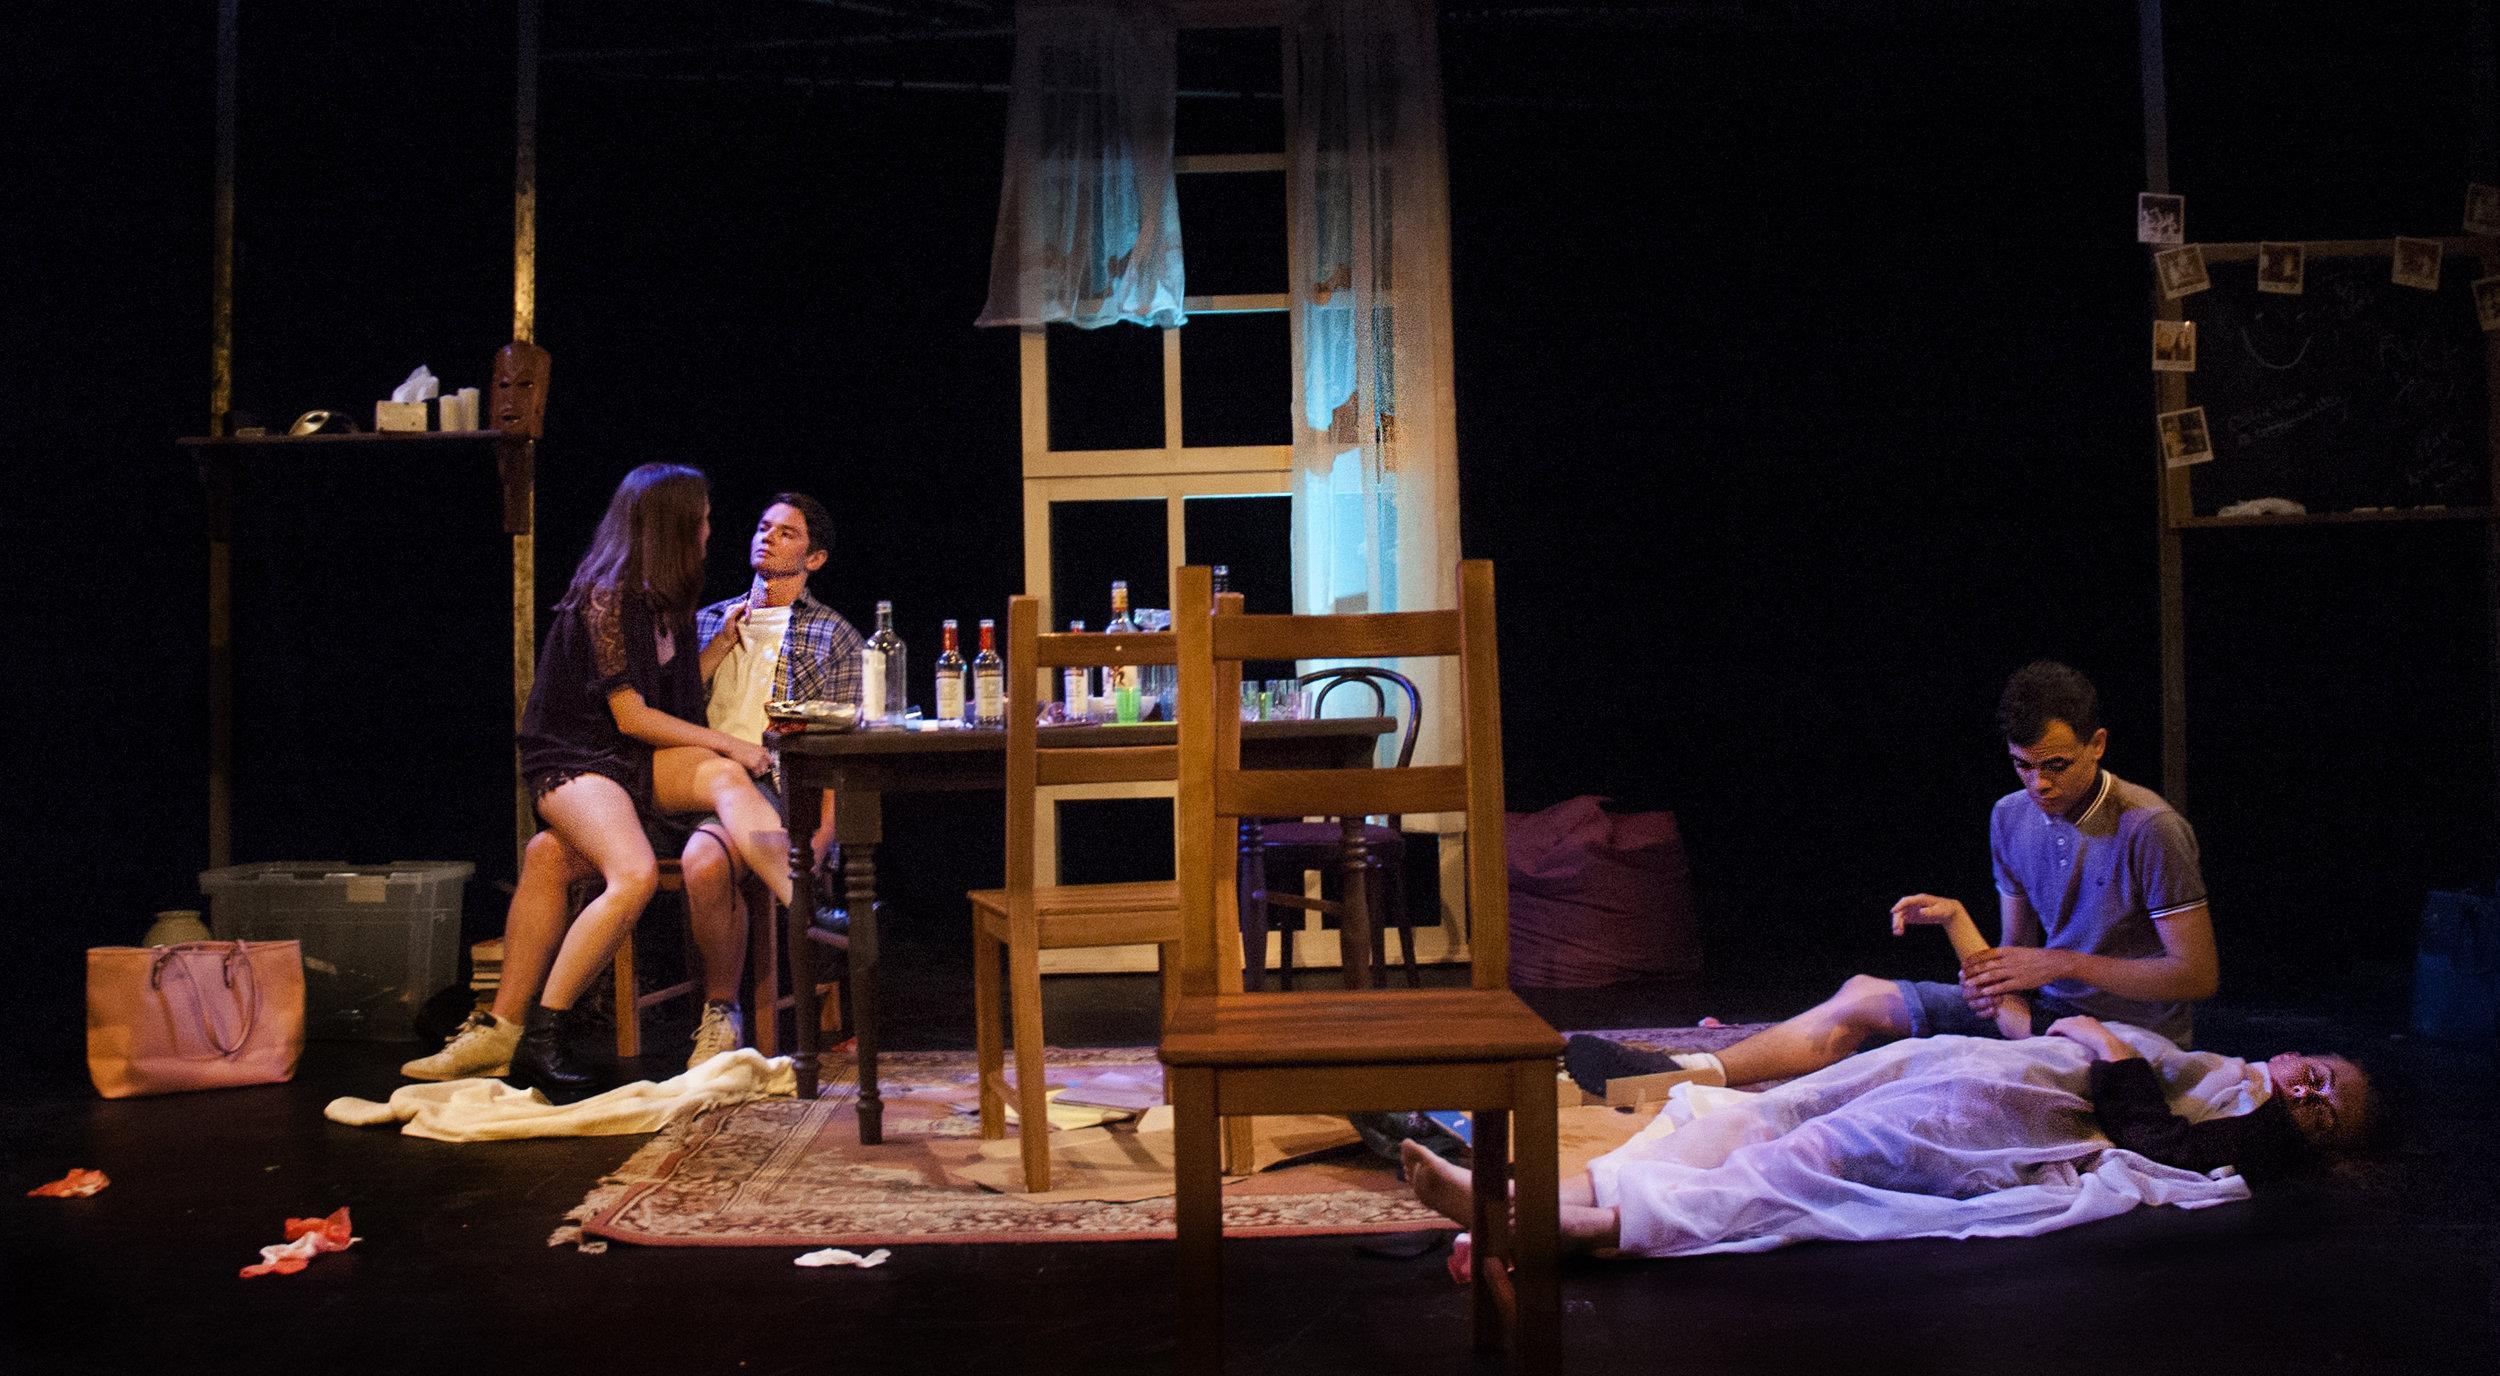 Jennie Eggleton (Carrie), George John (Christian), Kathryn Crosby (Laura) and Aaron Douglas (Ollie)